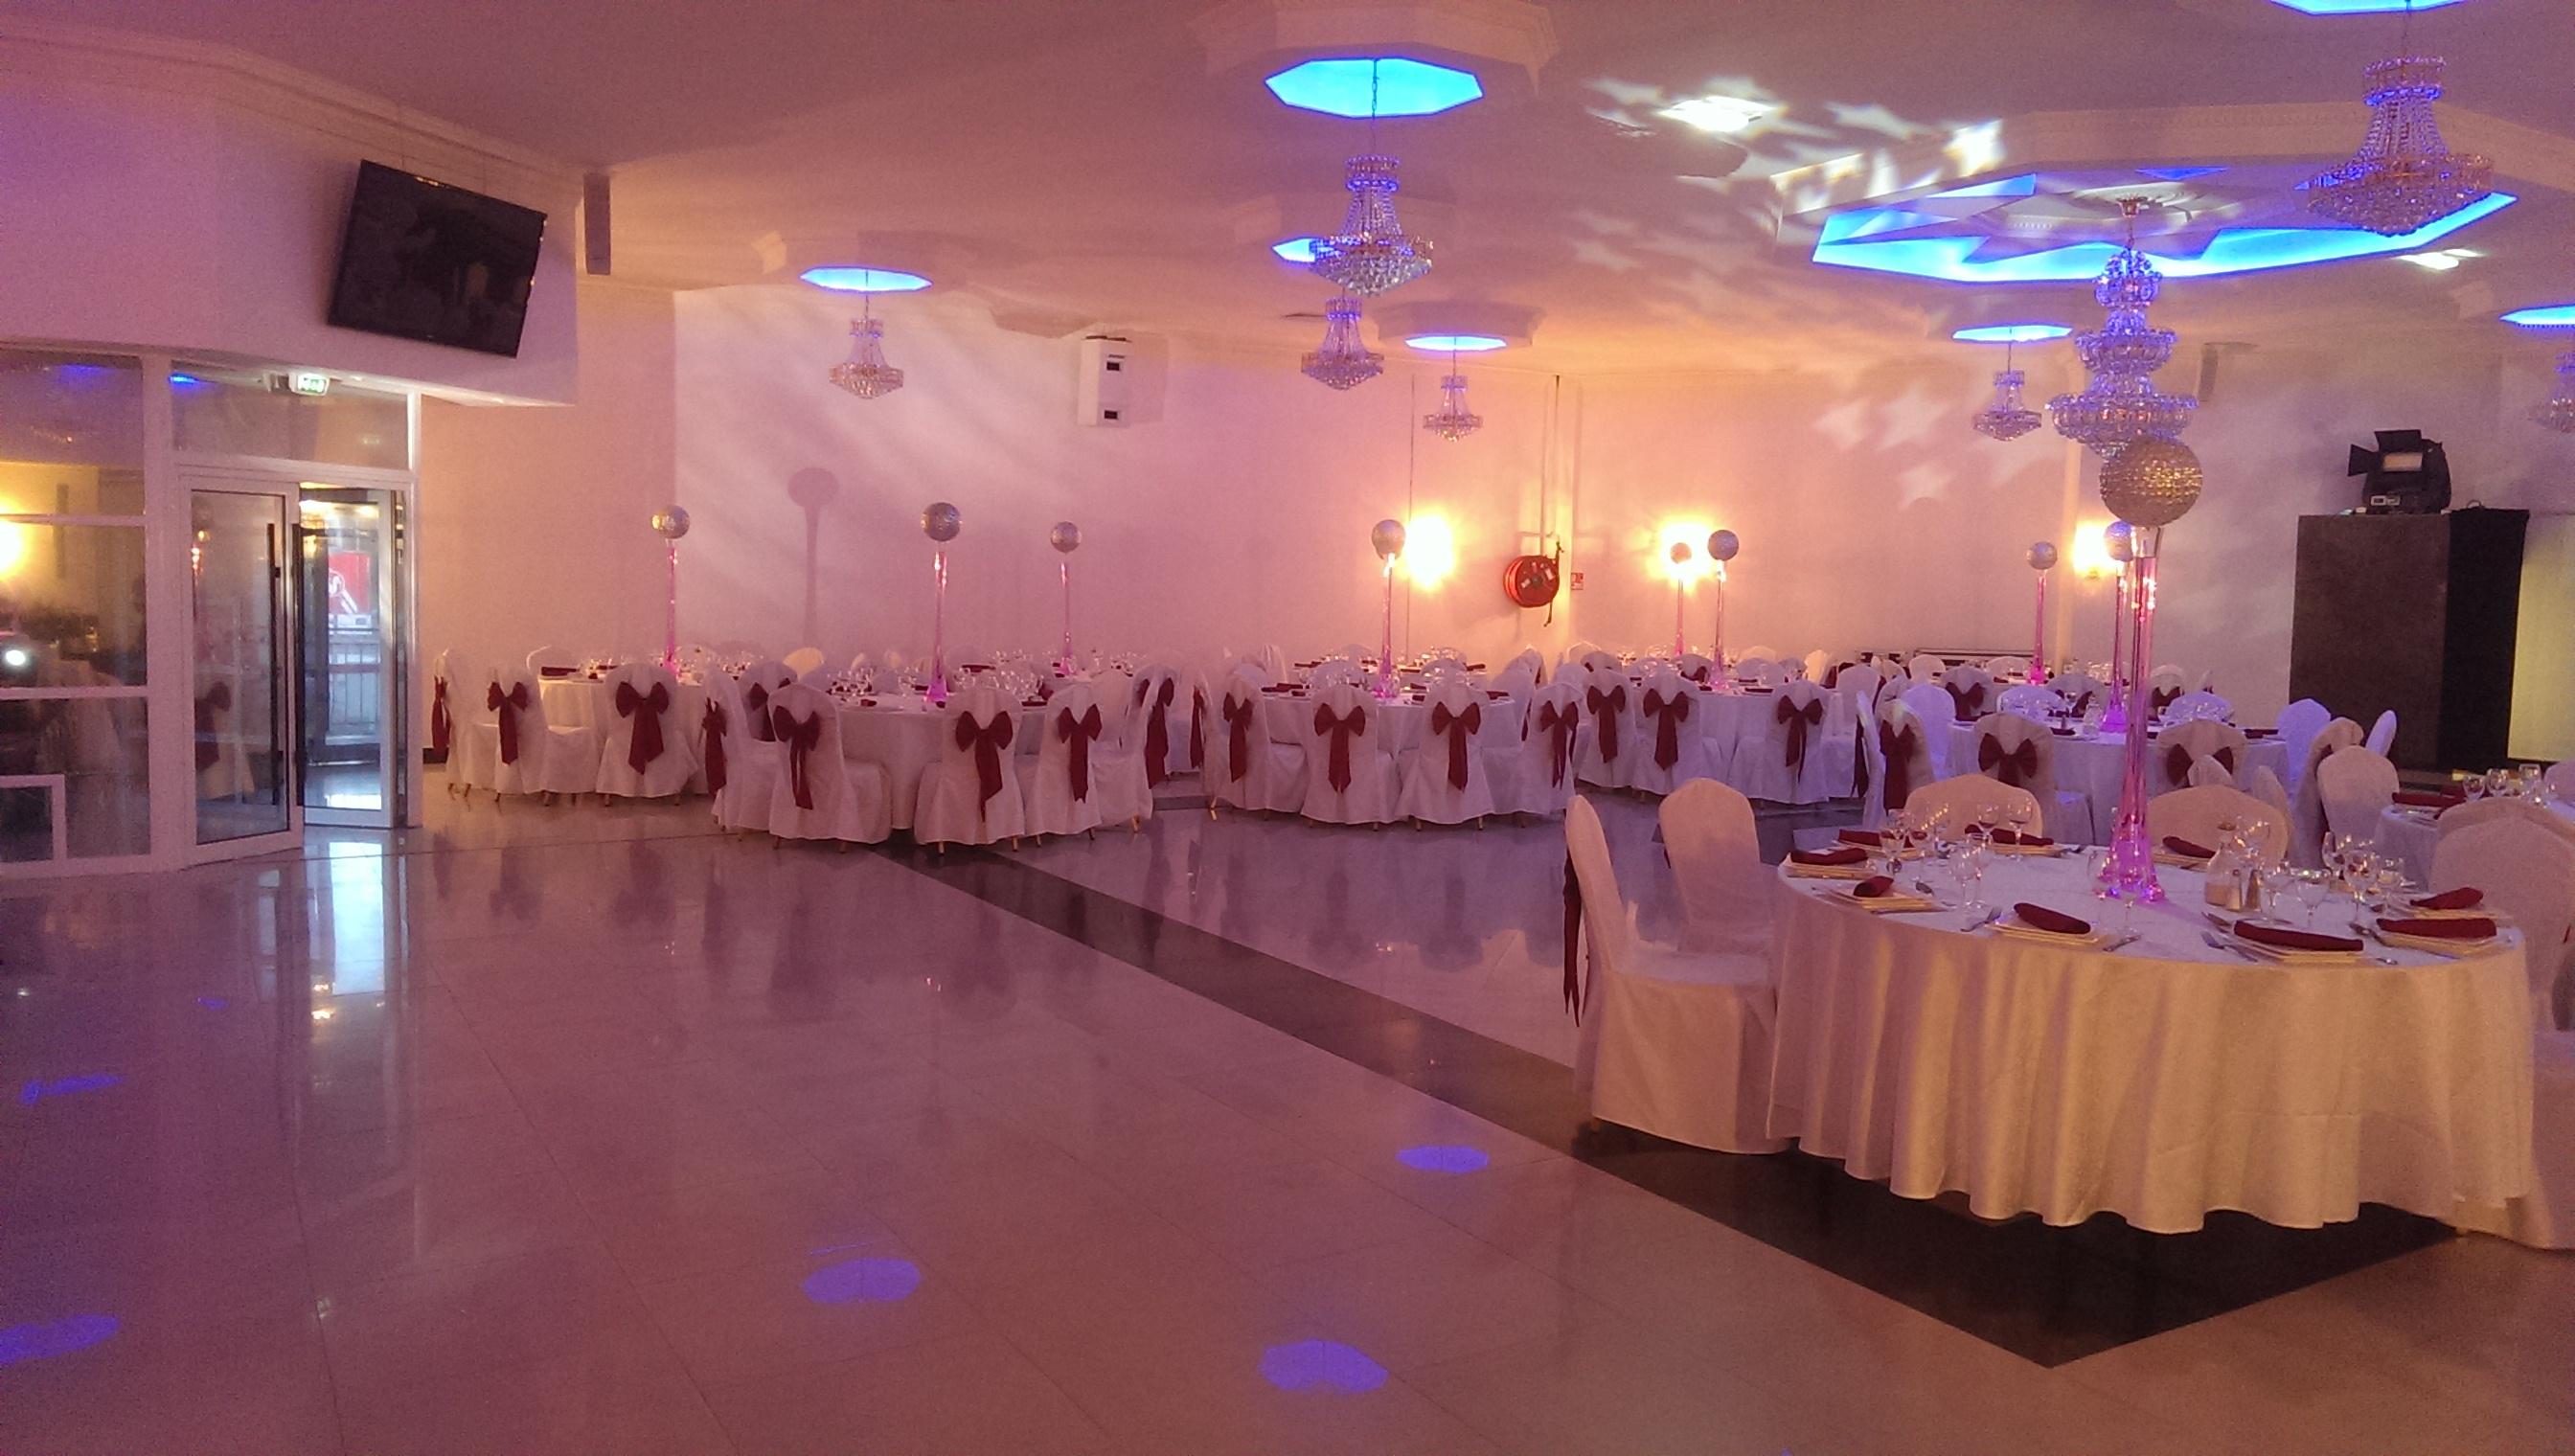 mariage oriental marocain - Salle Mariage Oriental Ile De France